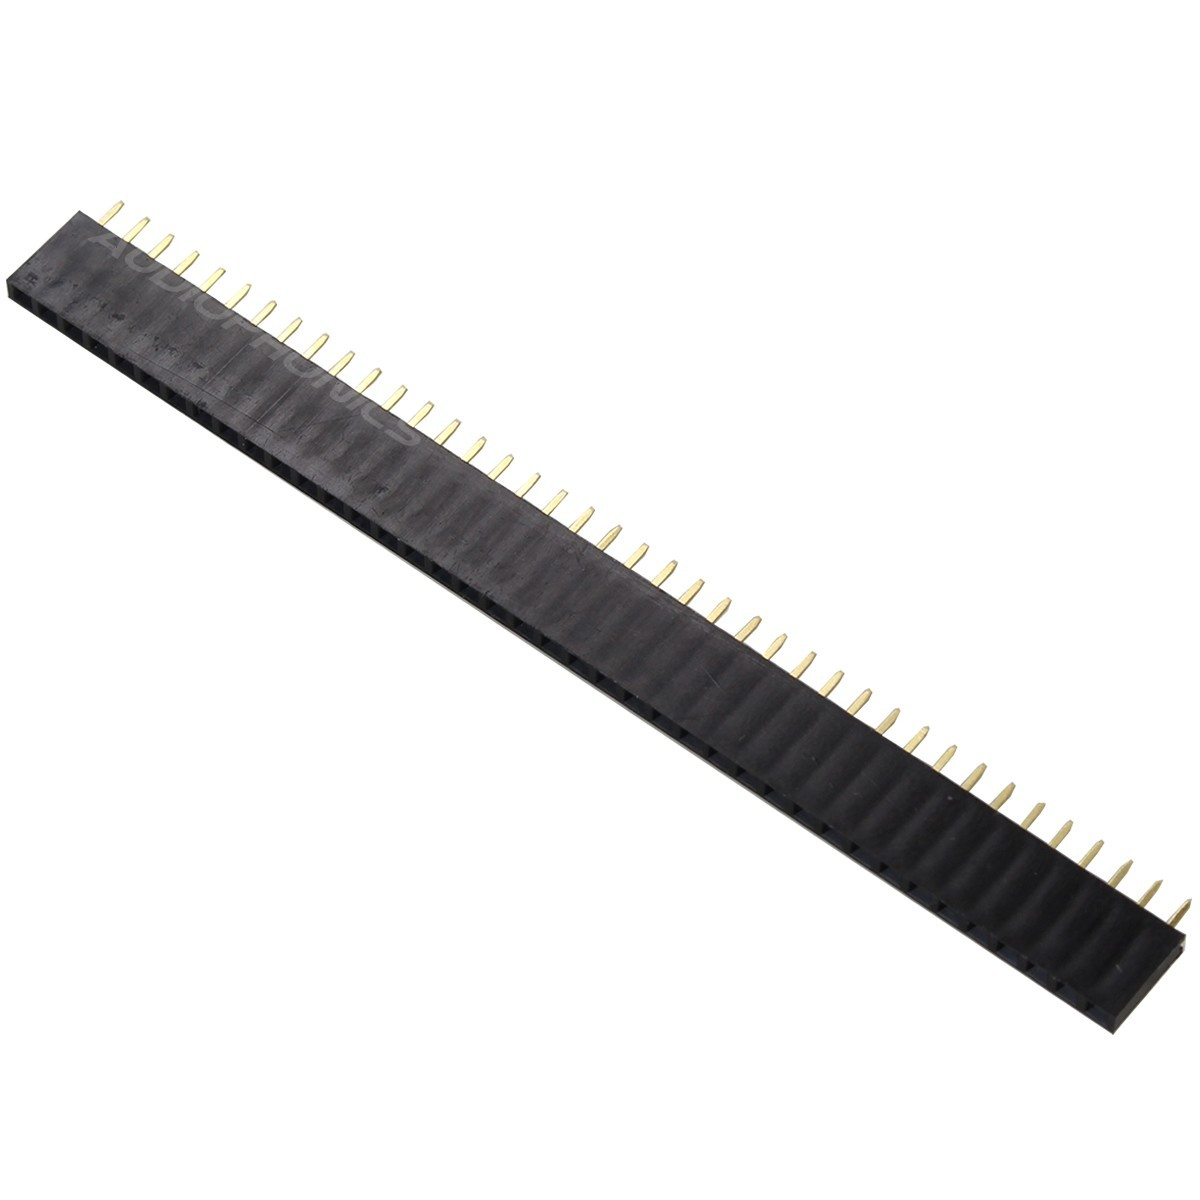 2.54mm Female Pin Header 40 Pins 3mm (Unit)